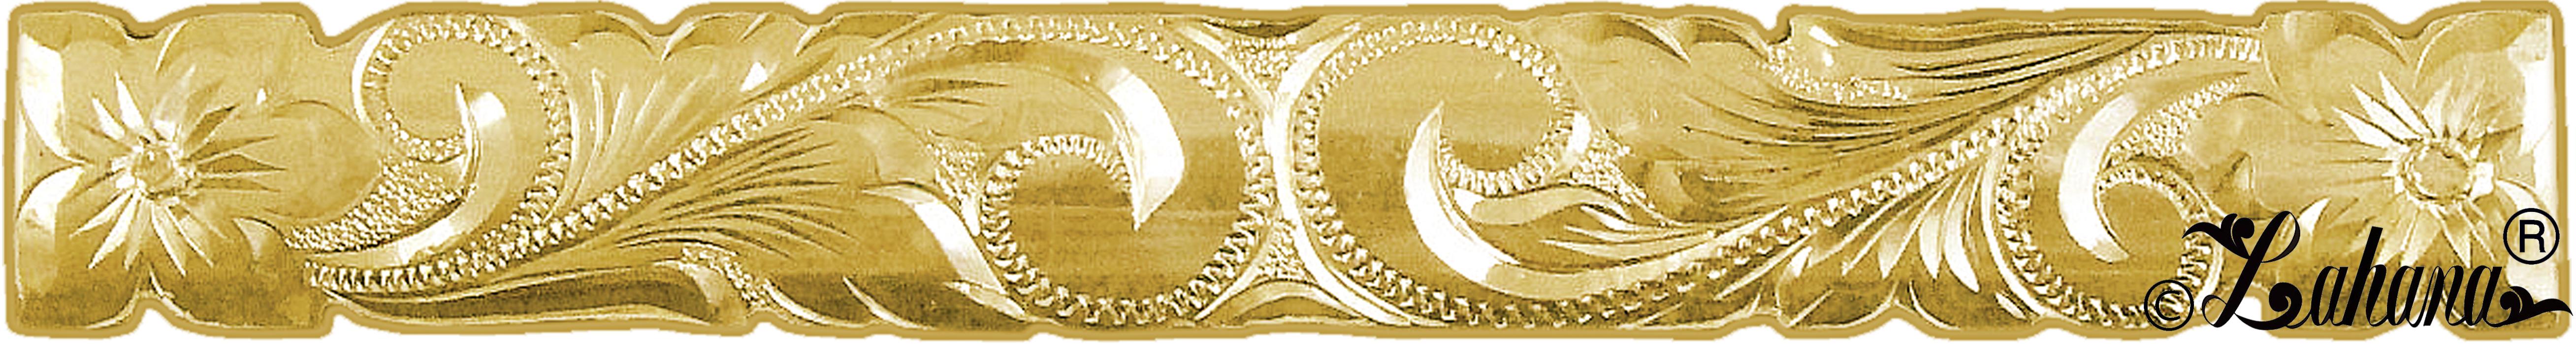 sample-logo-14k-td-f.jpg